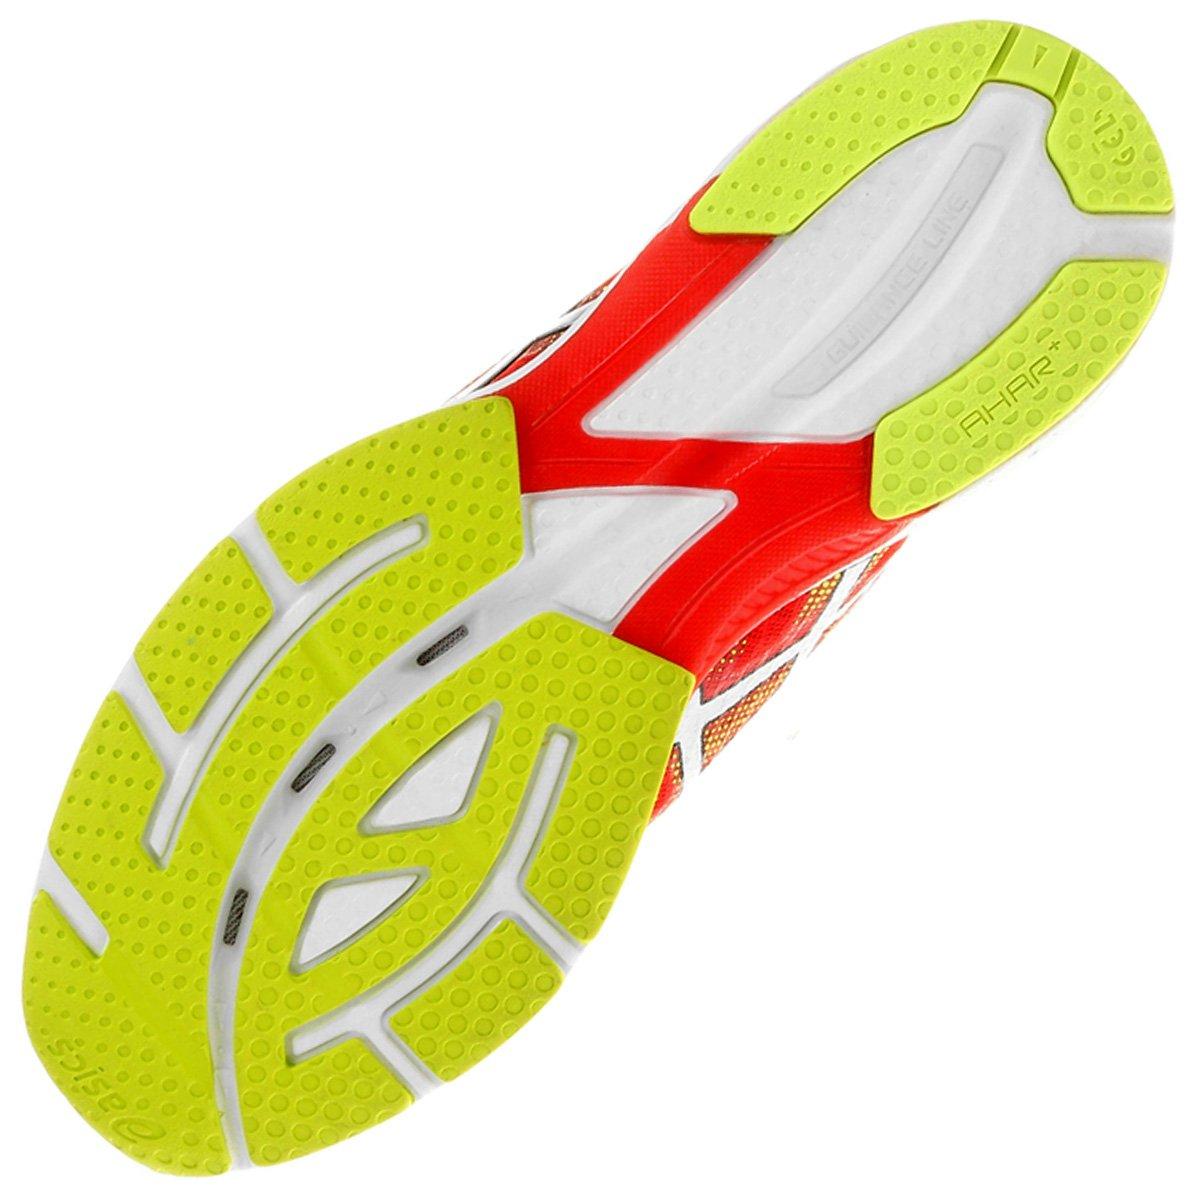 Tênis Asics Gel DS Racer 10 Masculino - Compre Agora  02f1ce2a396ff